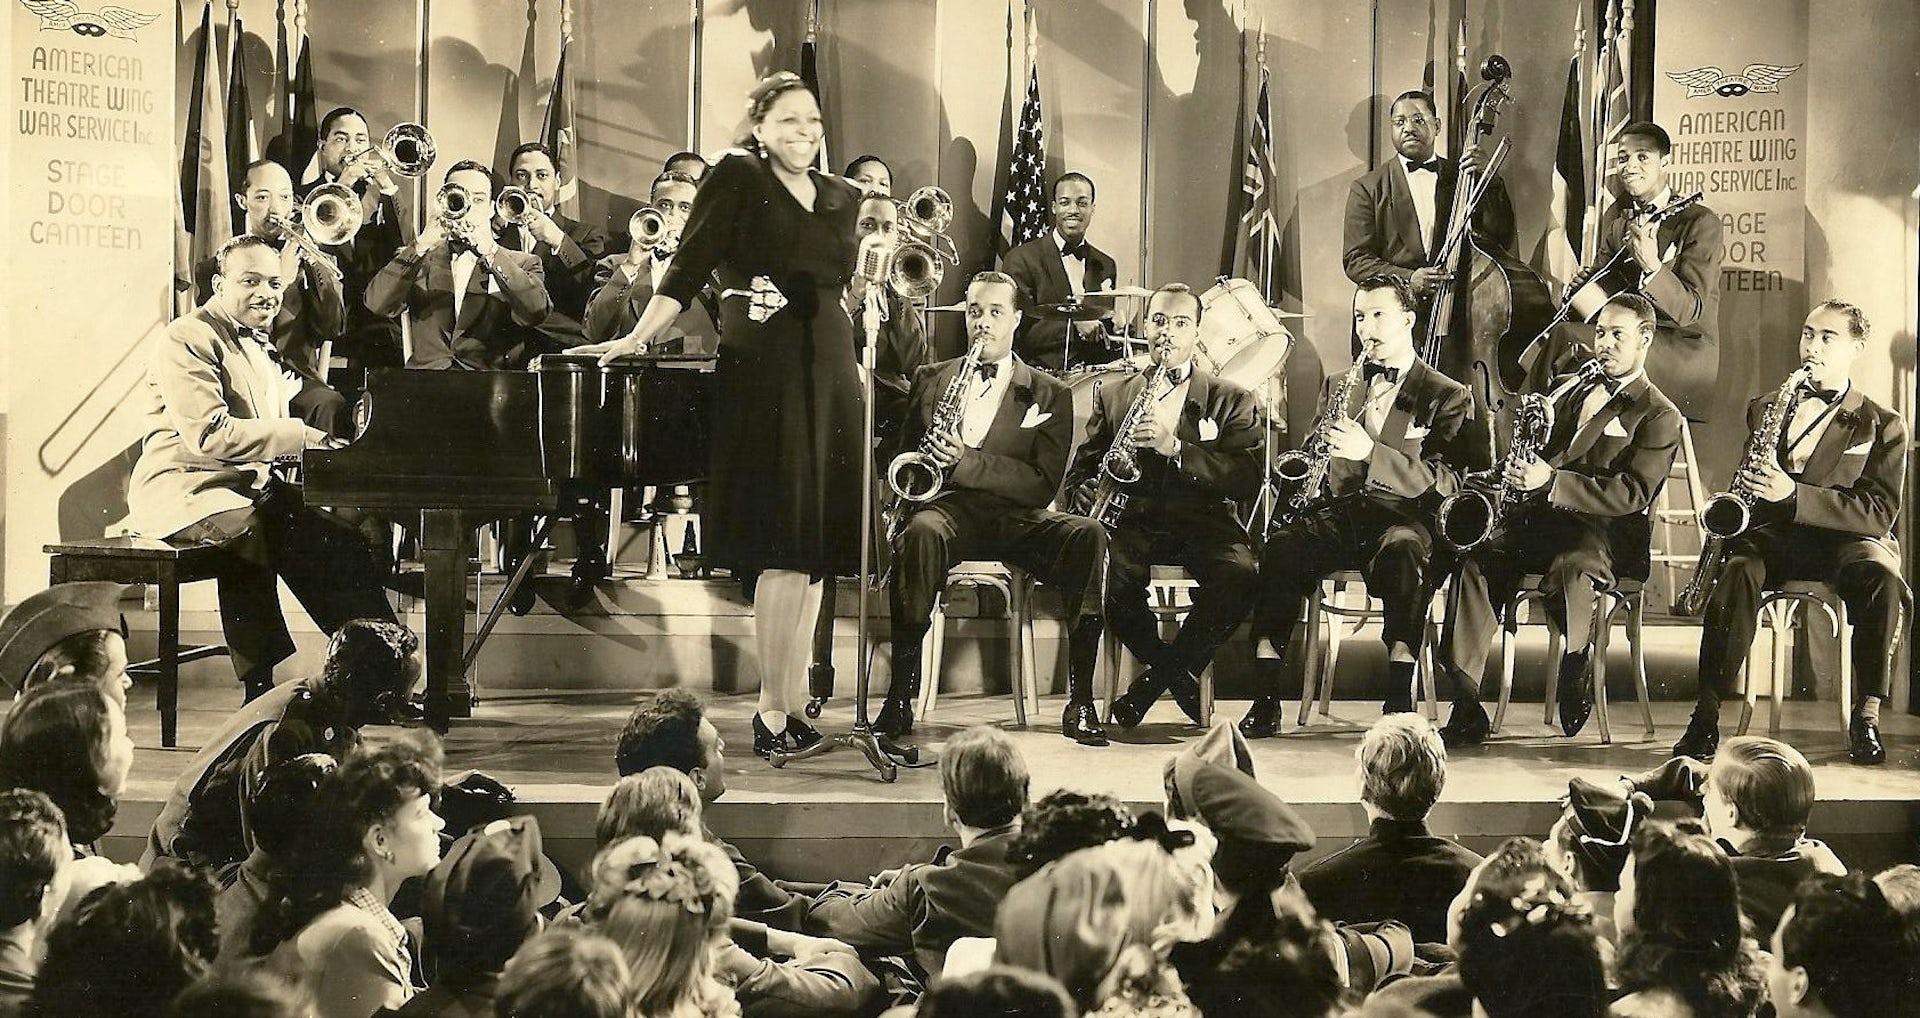 jazz music concert review essay